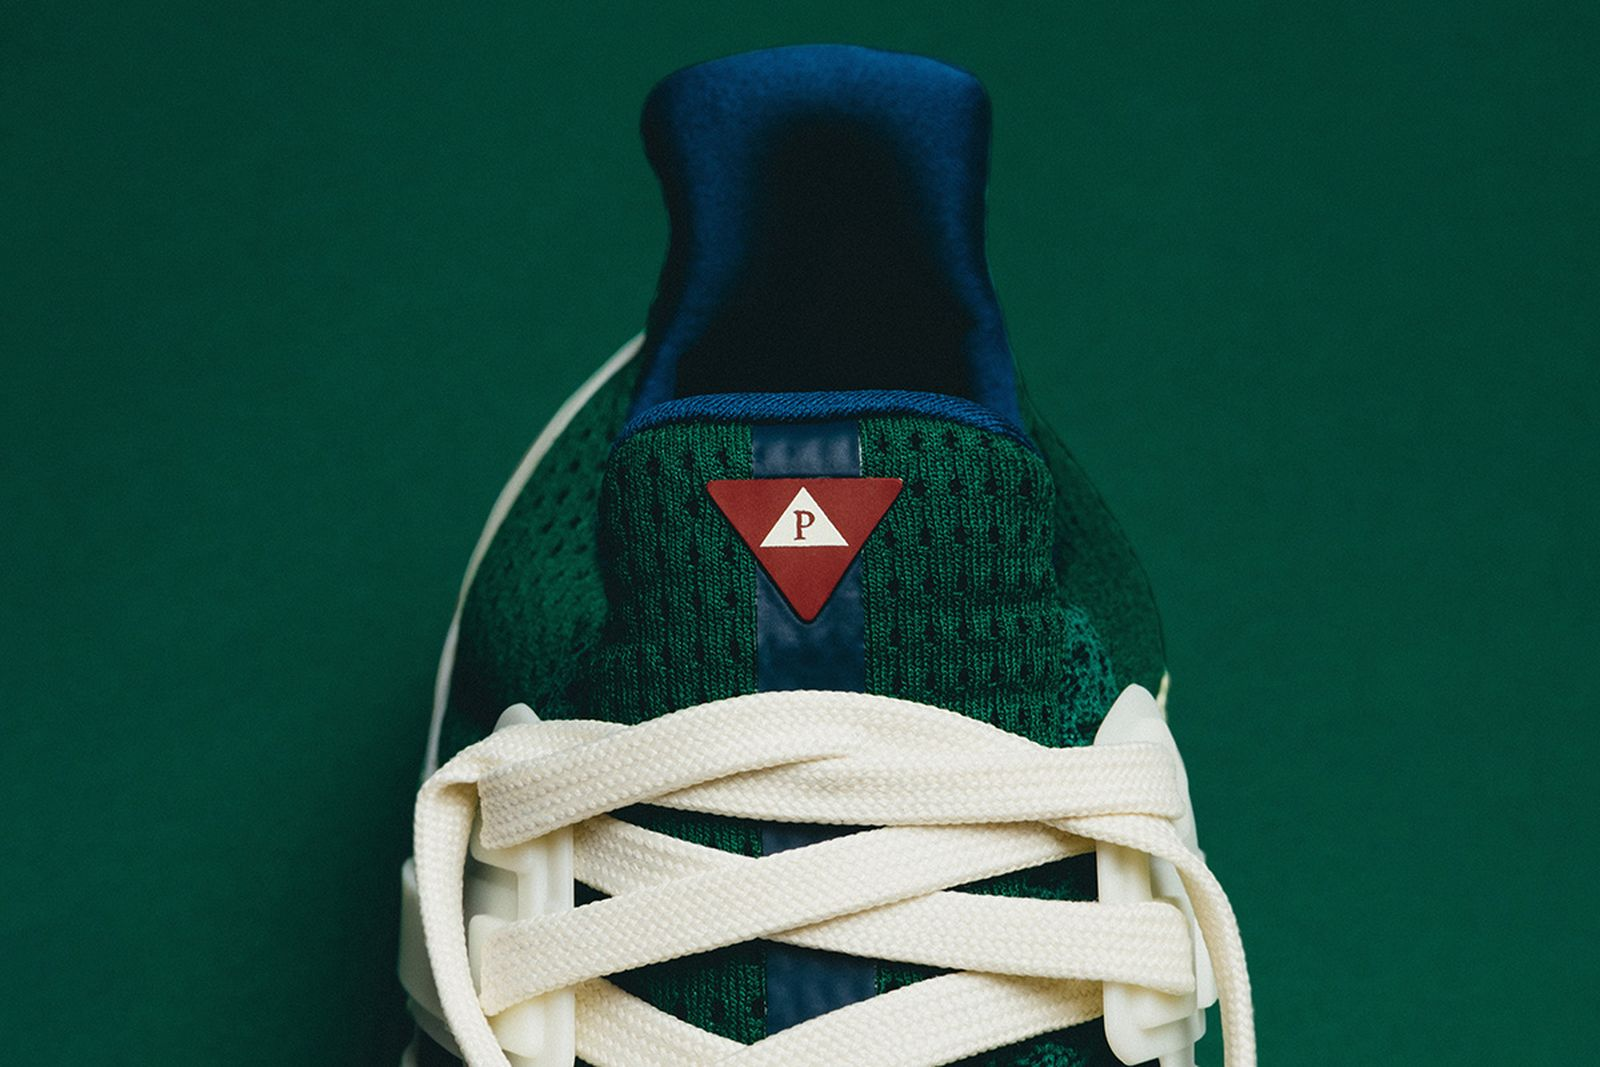 packer-adidas-consortium-ultra-4d-release-date-price-03